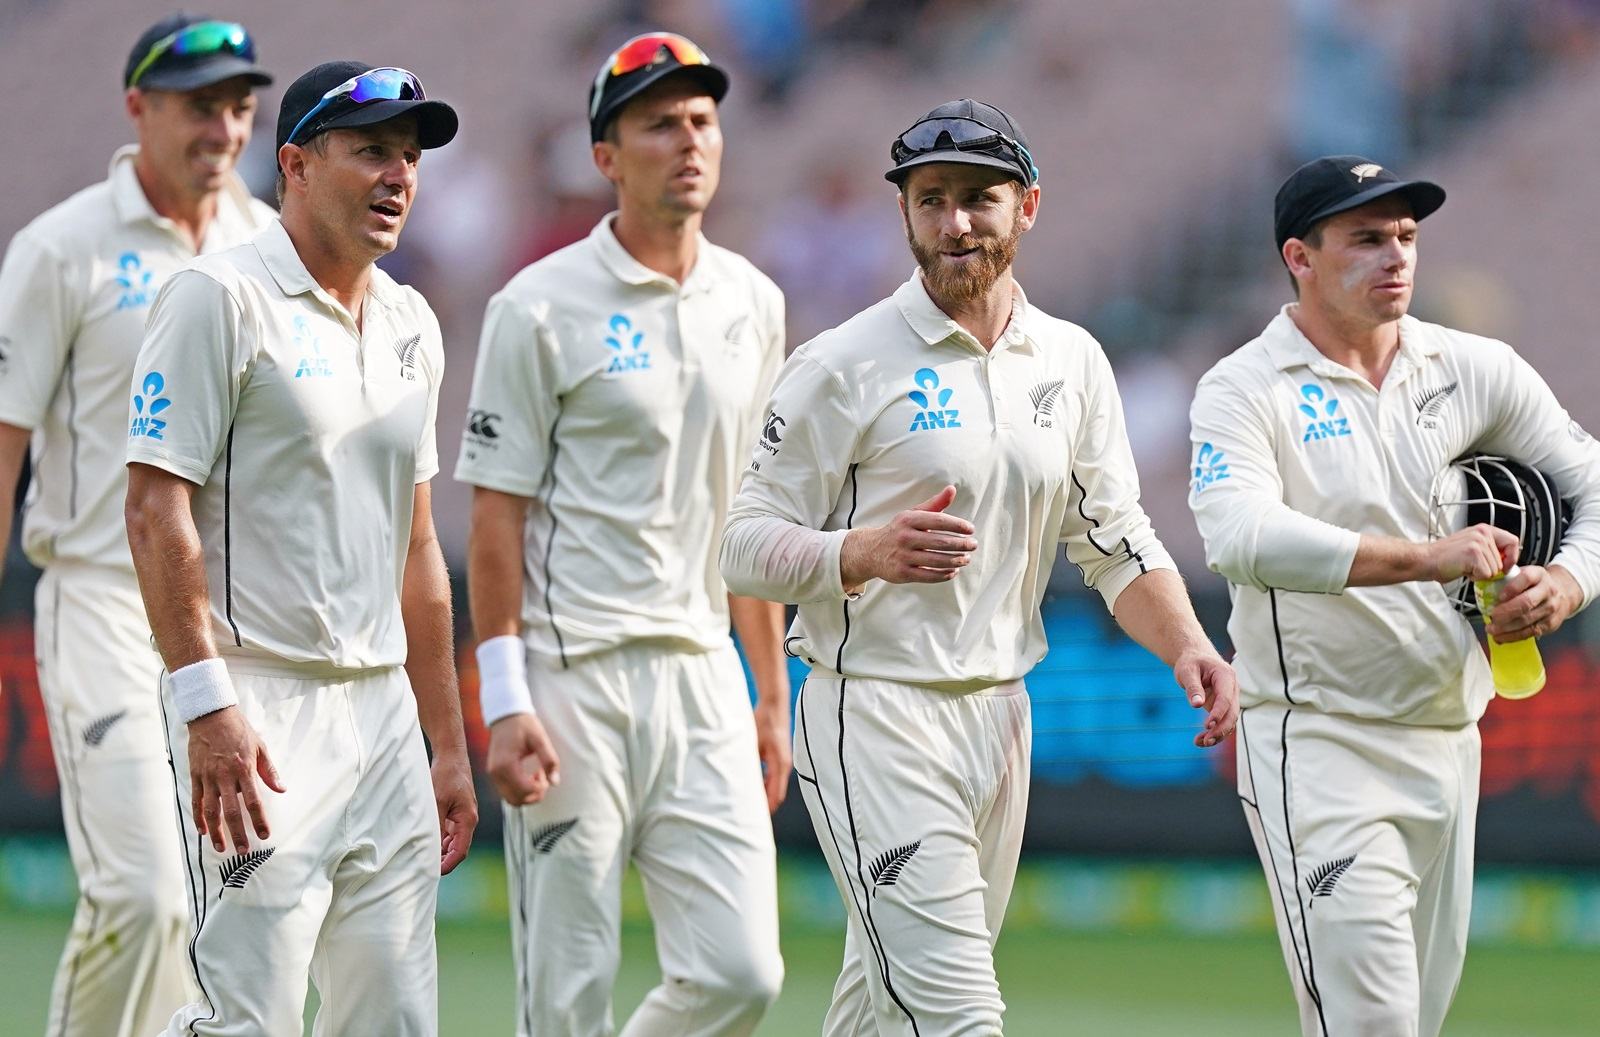 Black Caps sweating on Williamson's fitness | cricket.com.au